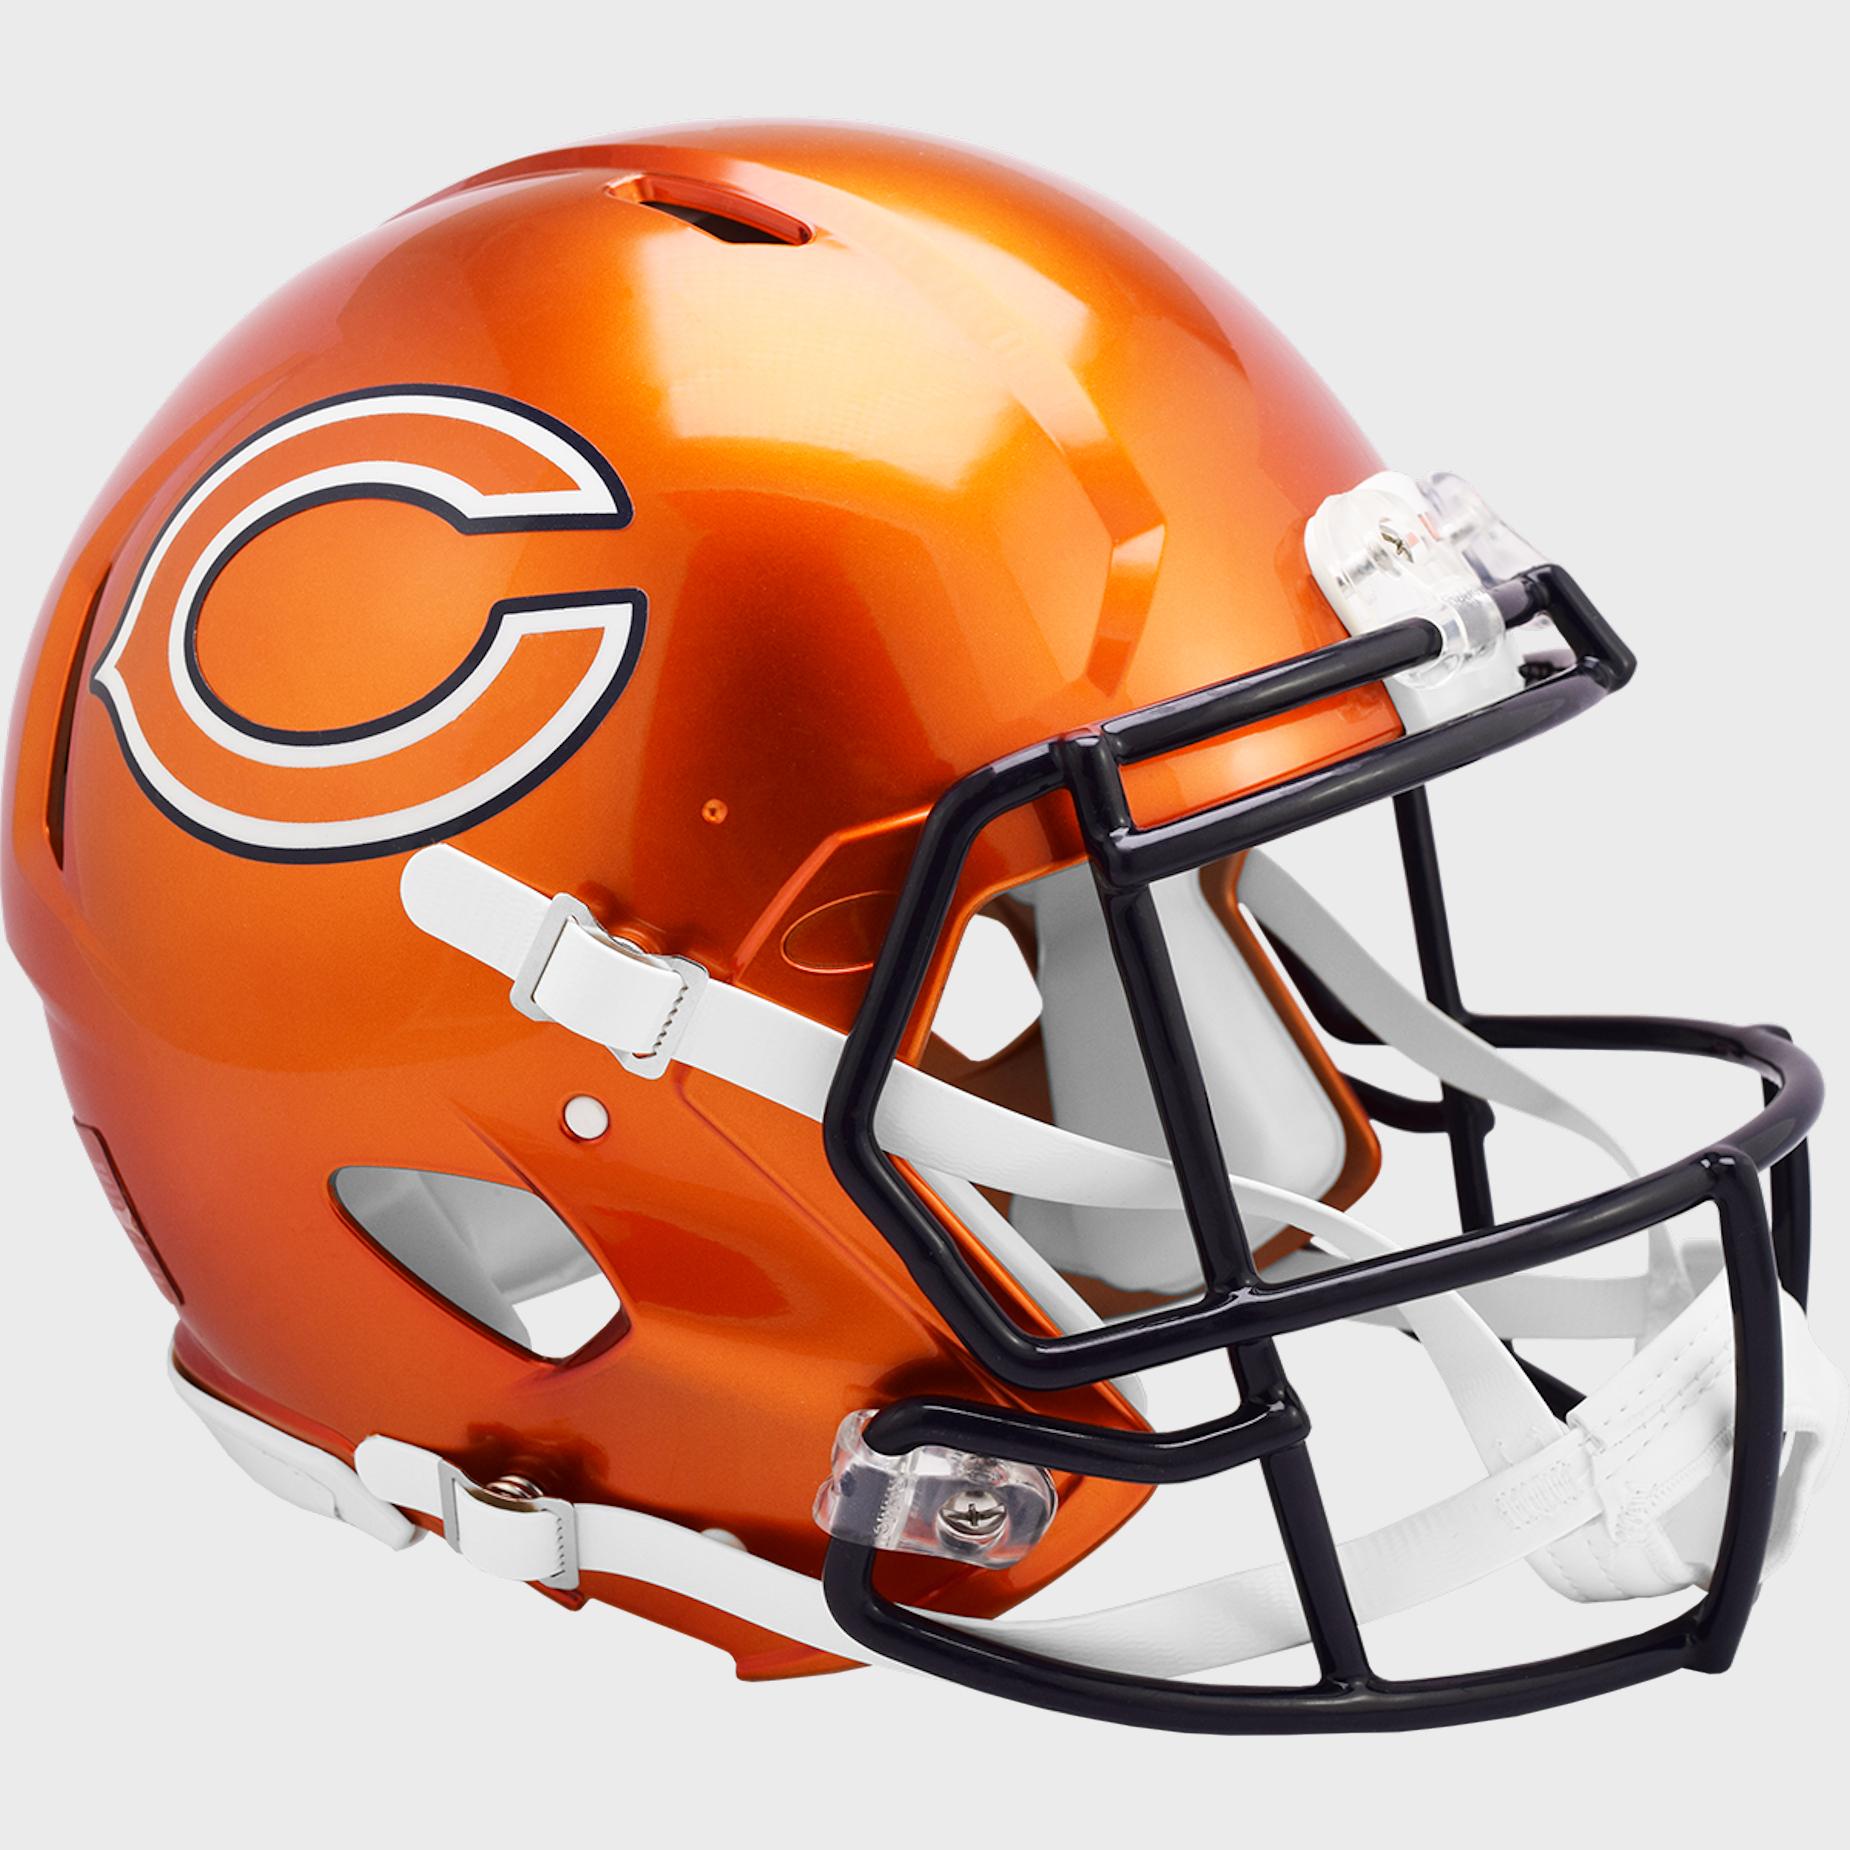 Chicago Bears Speed Football Helmet <B>FLASH ESD 8/21/21</B>